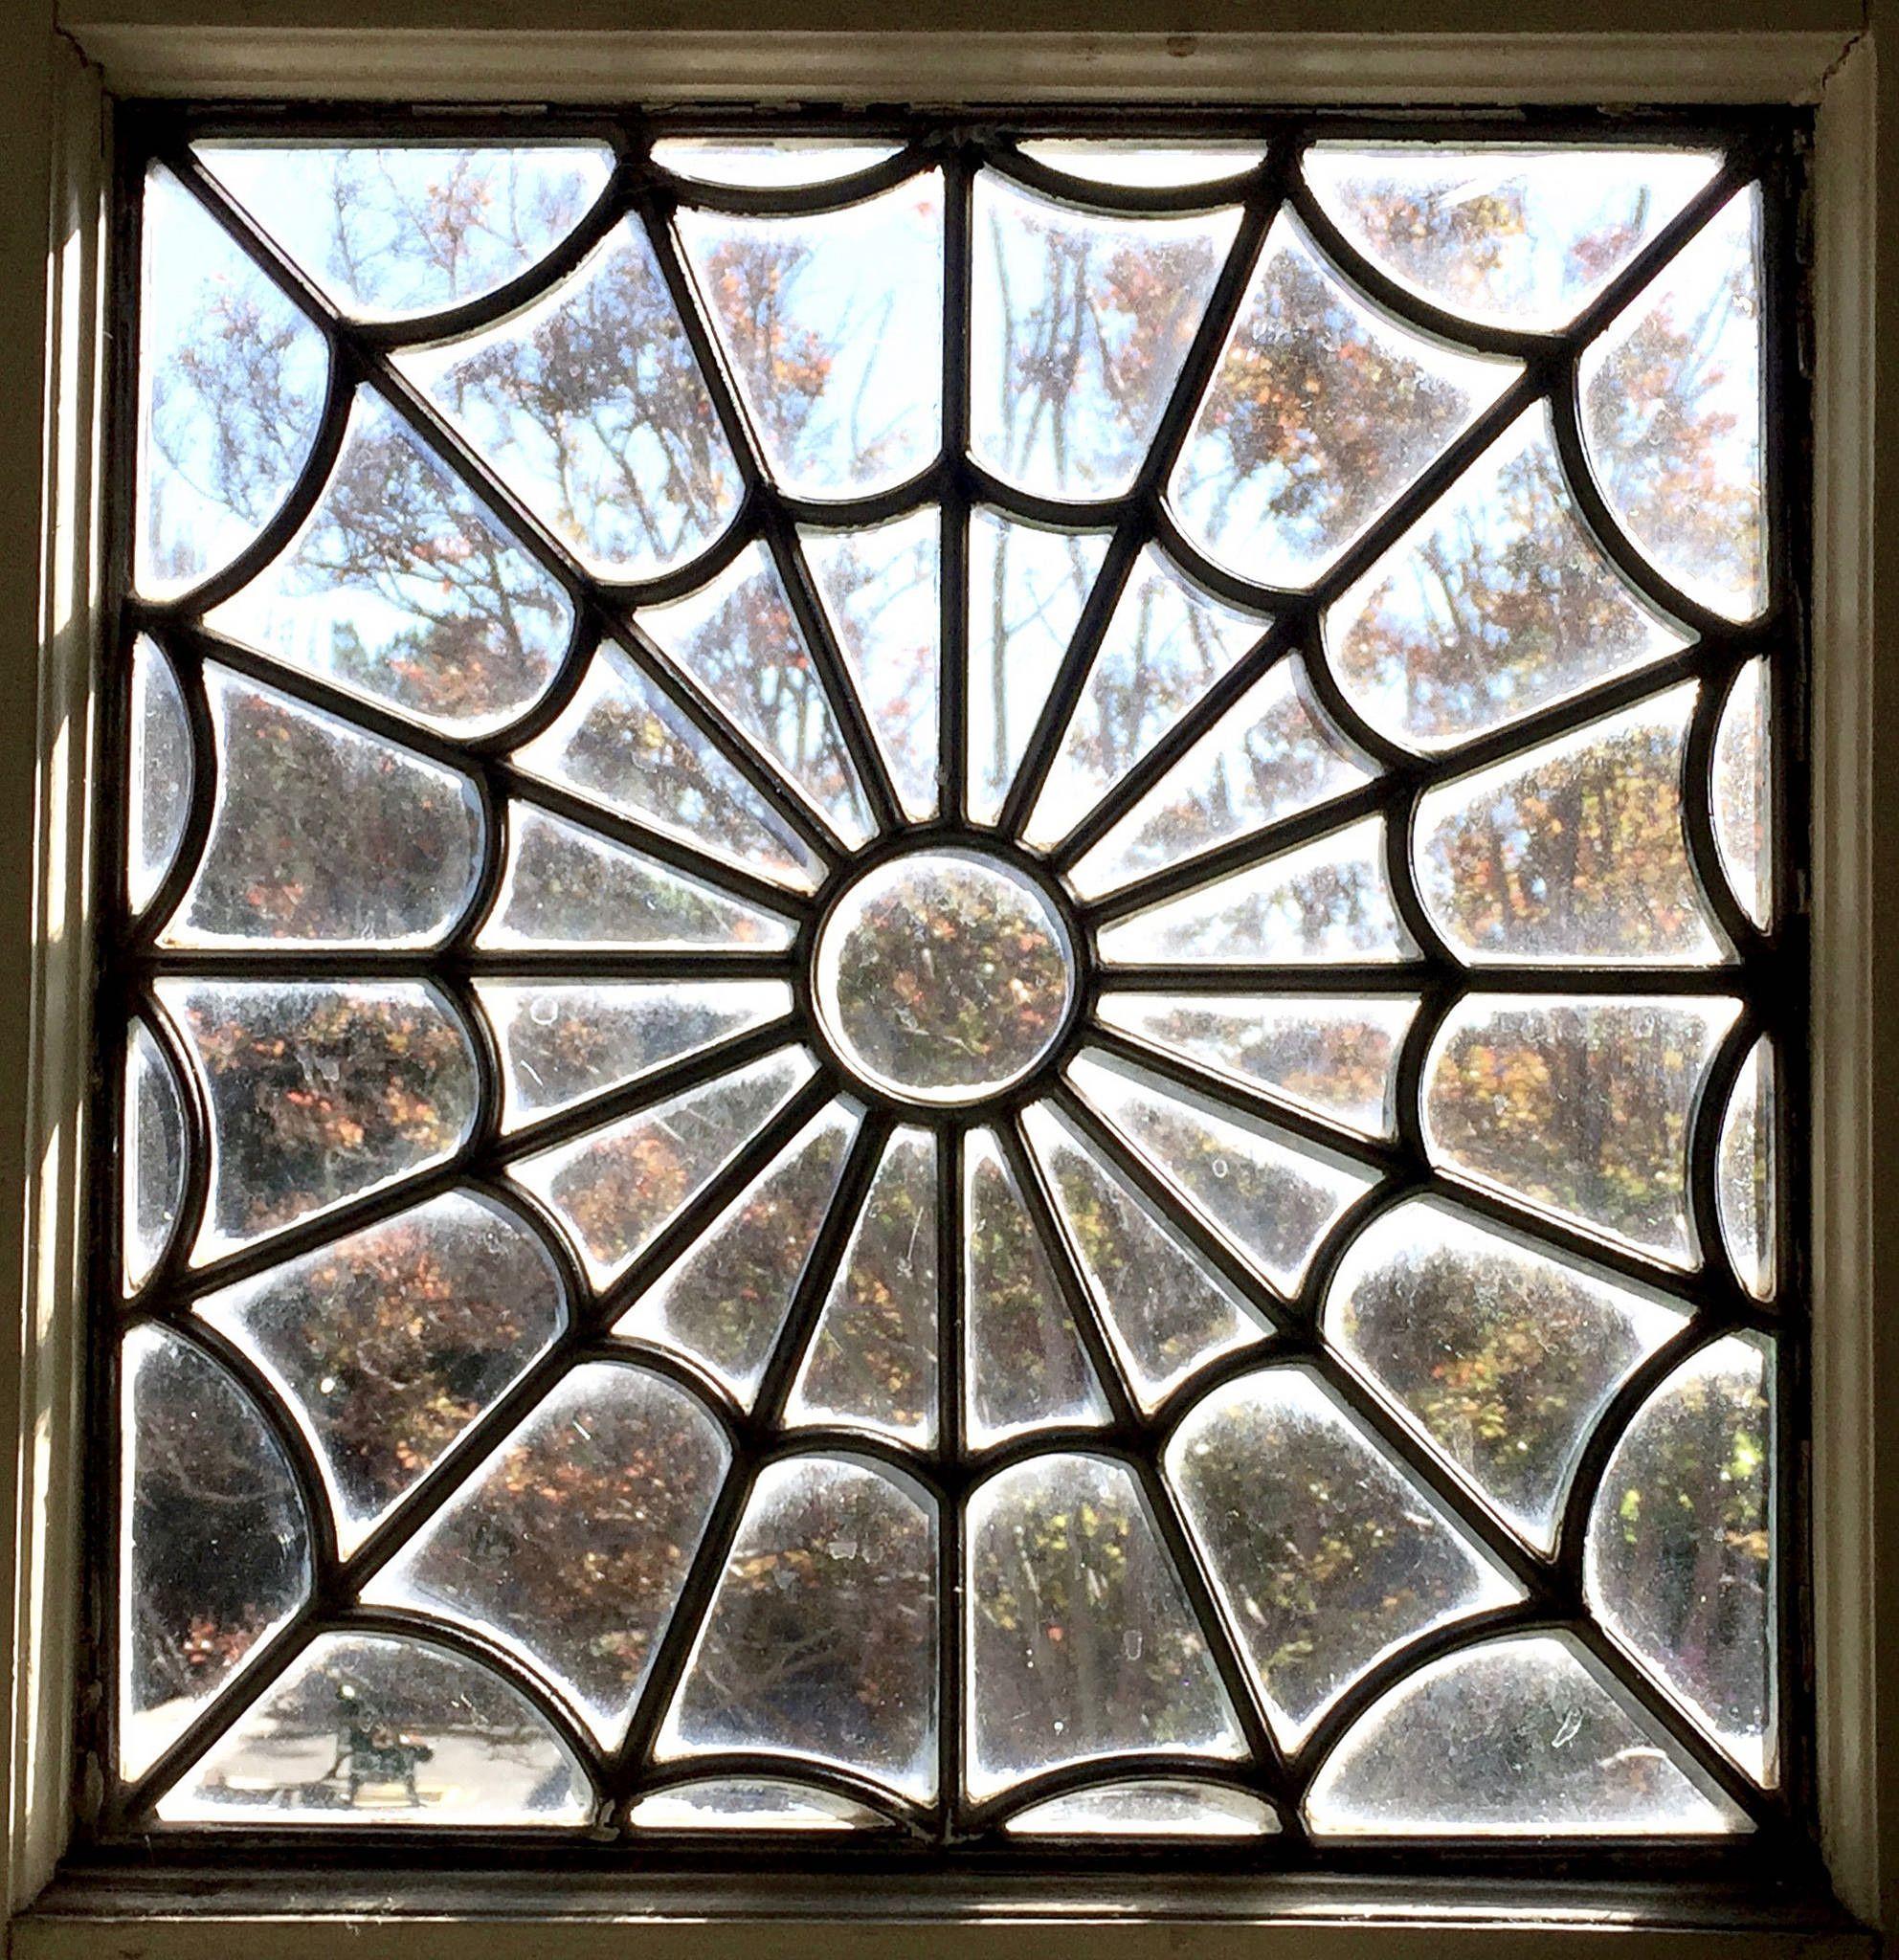 spider web window winchester mystery house san jose california